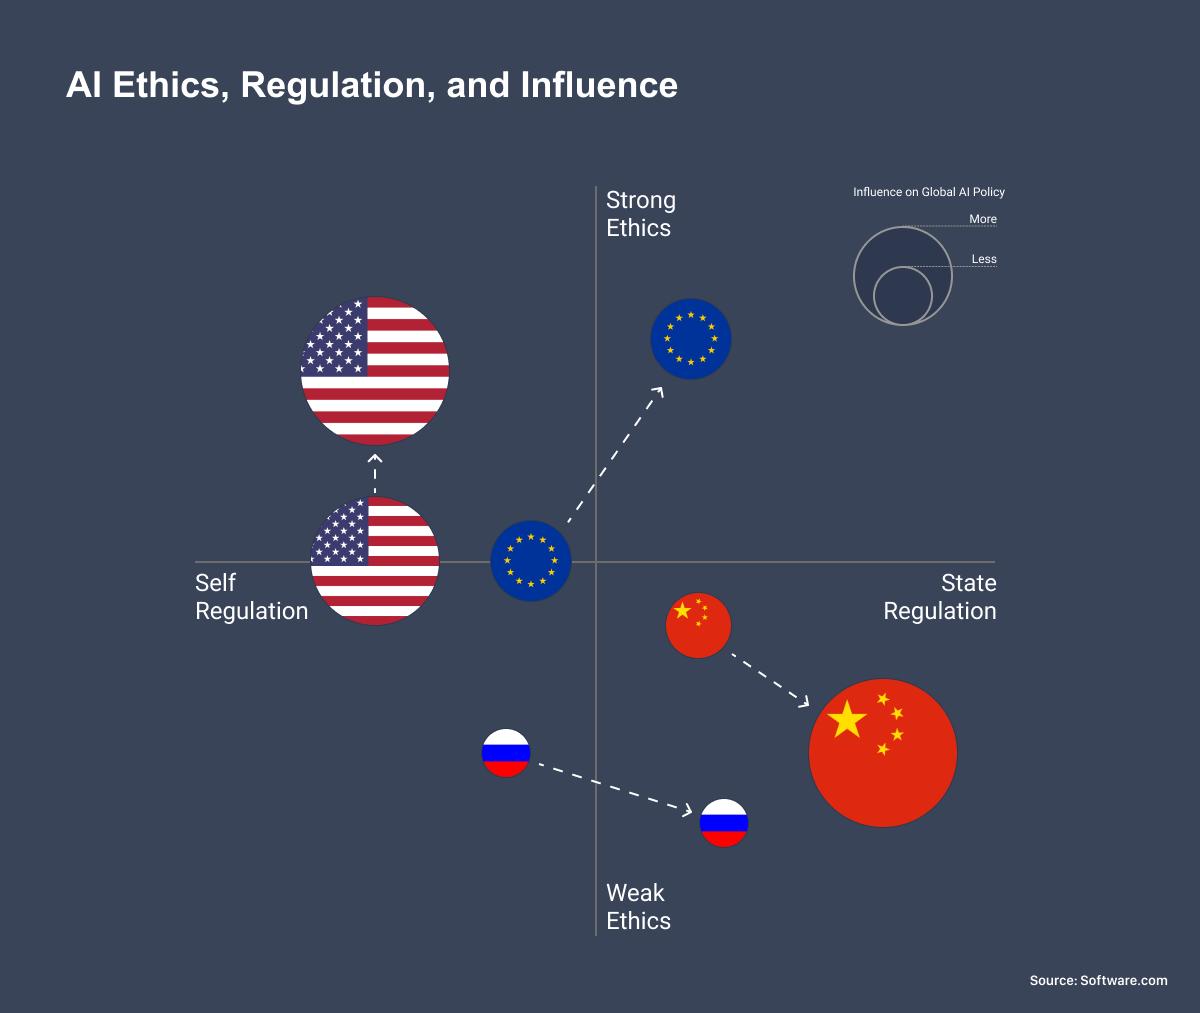 AI Ethics, Regulation, and Influence